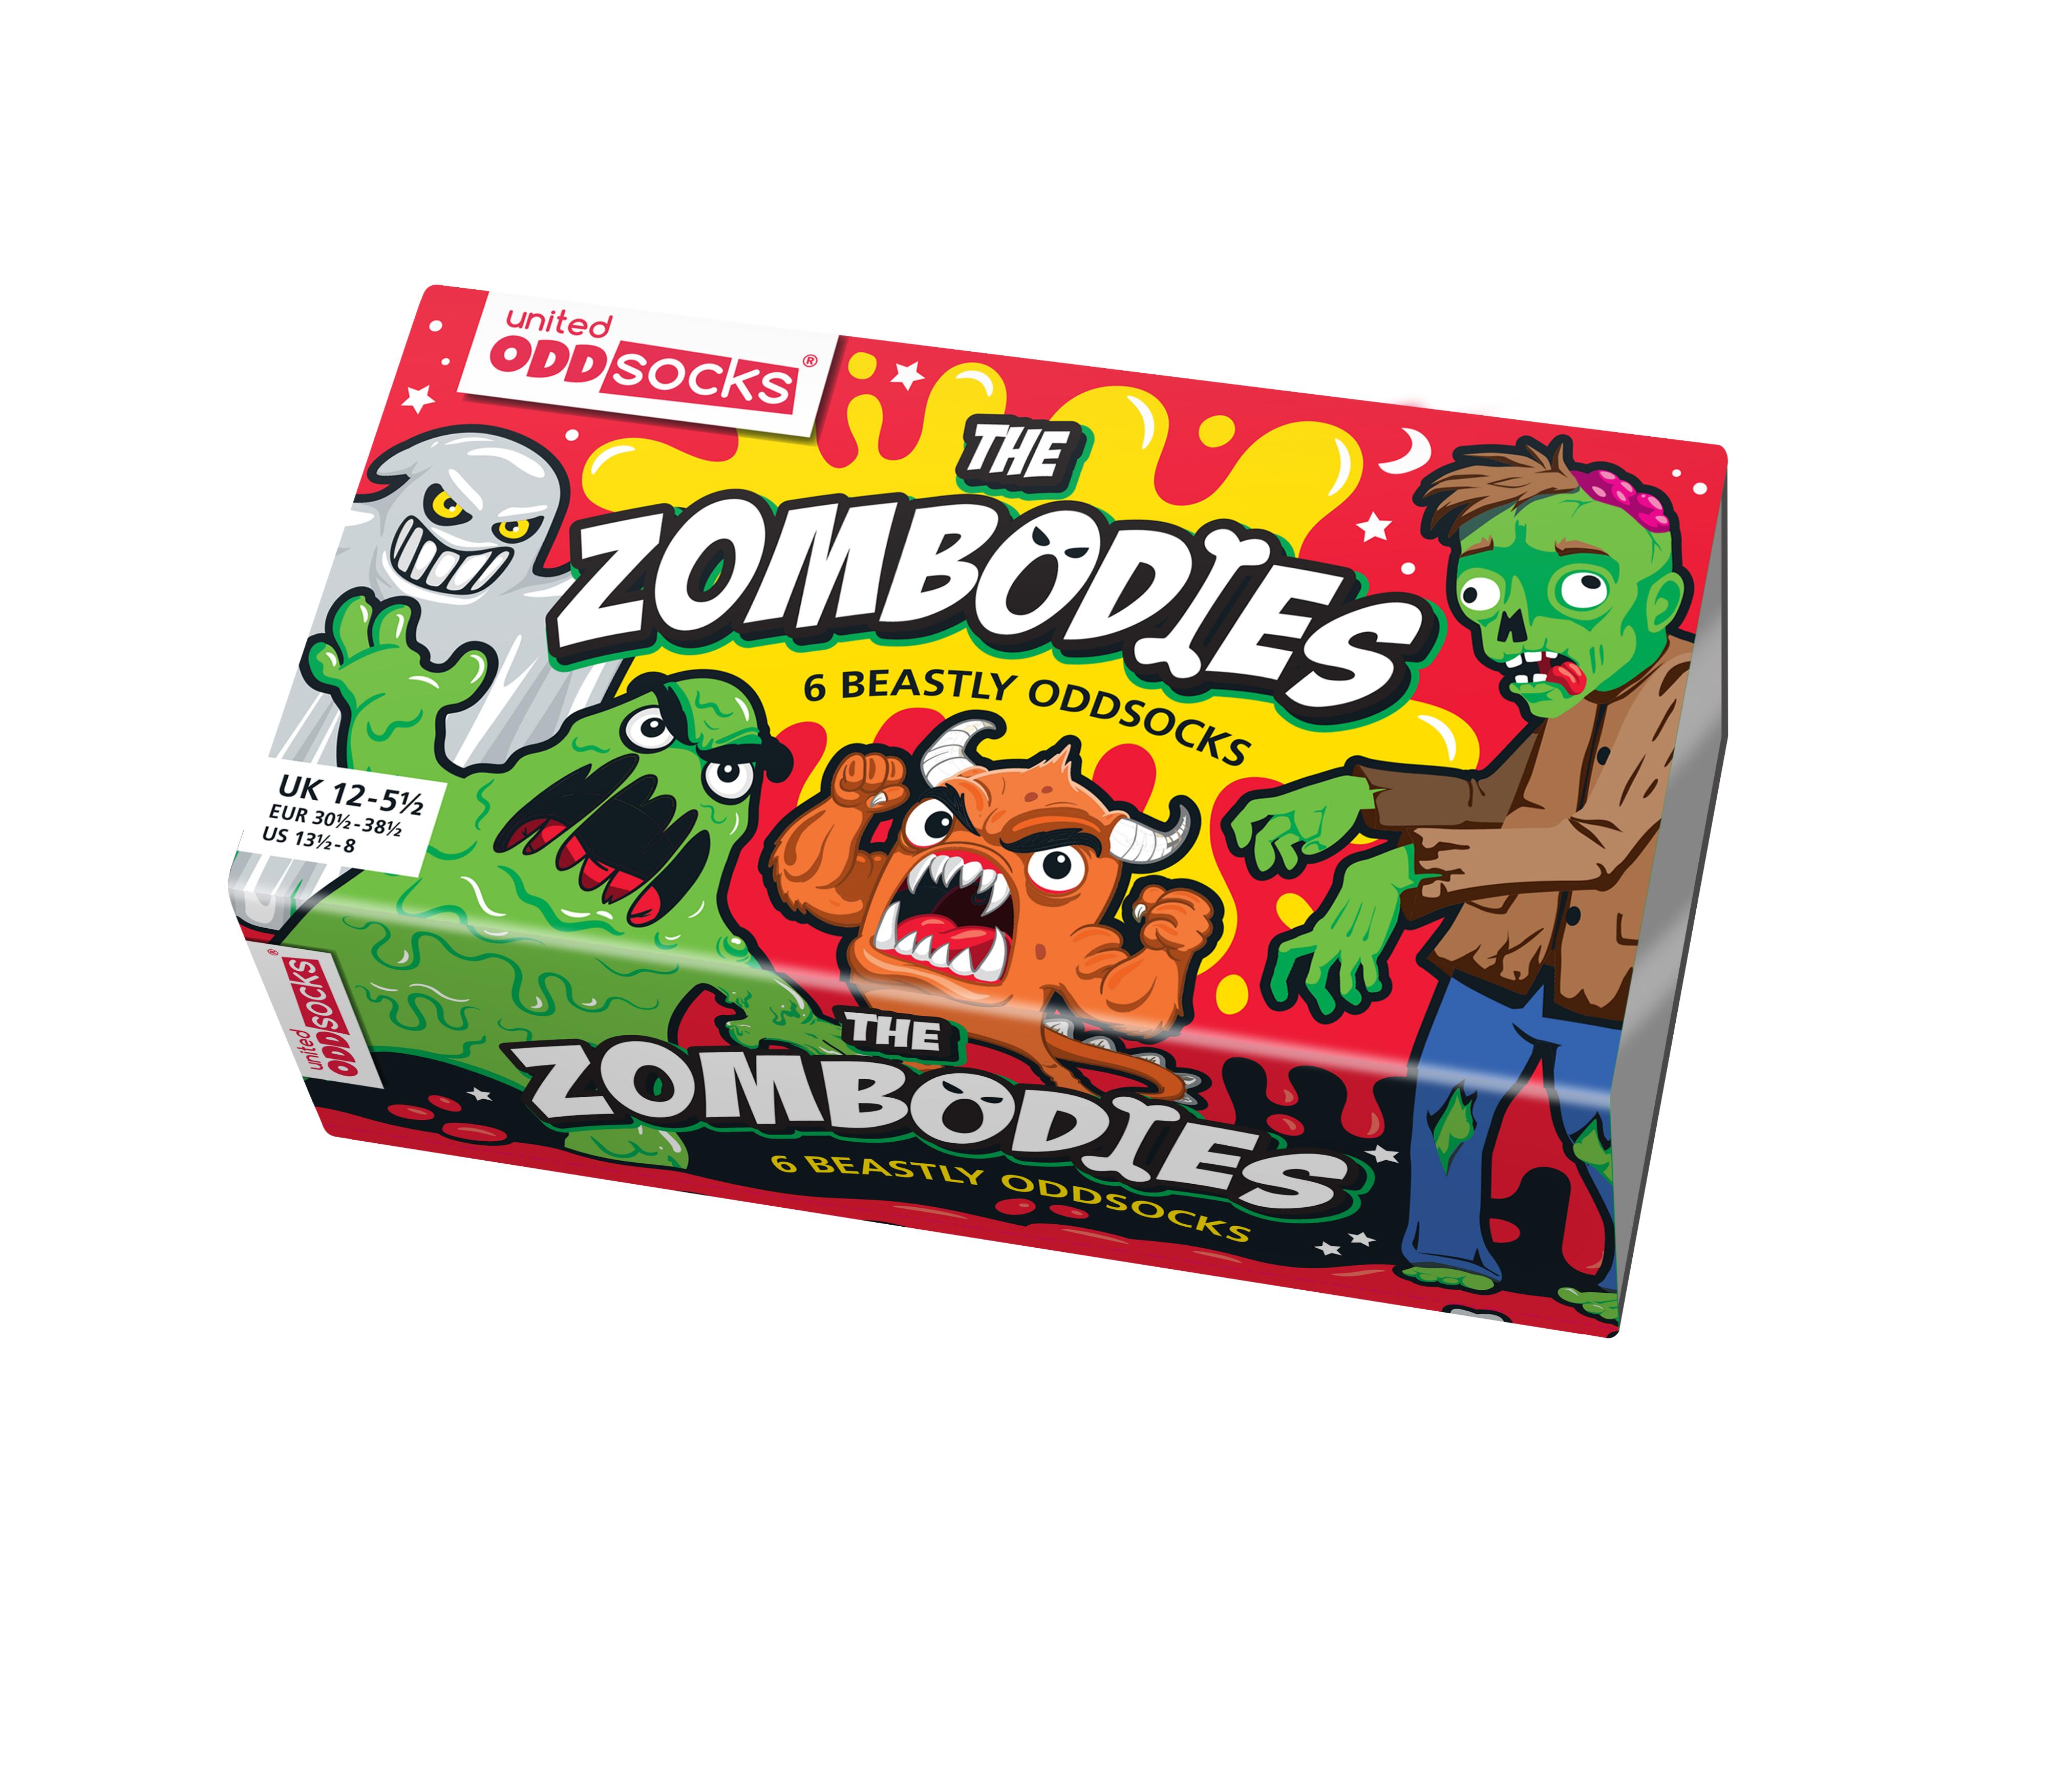 Zombodies UK 12-5.5 EUR 30.5-38.5 US 13.5-8 United Oddsocks Box of 6 Oddsocks For Boys